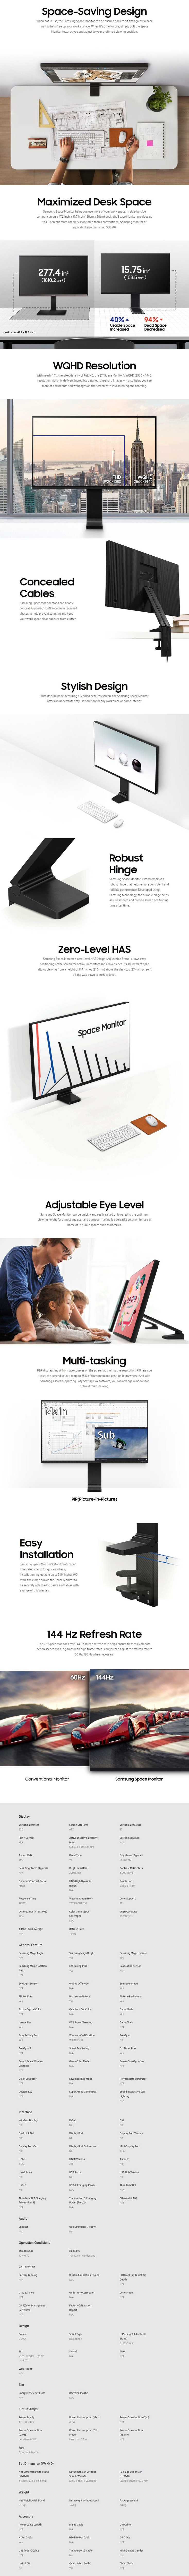 "Samsung LS27R750QEEXXY 27"" 144Hz WQHD VA Monitor - Overview 1"